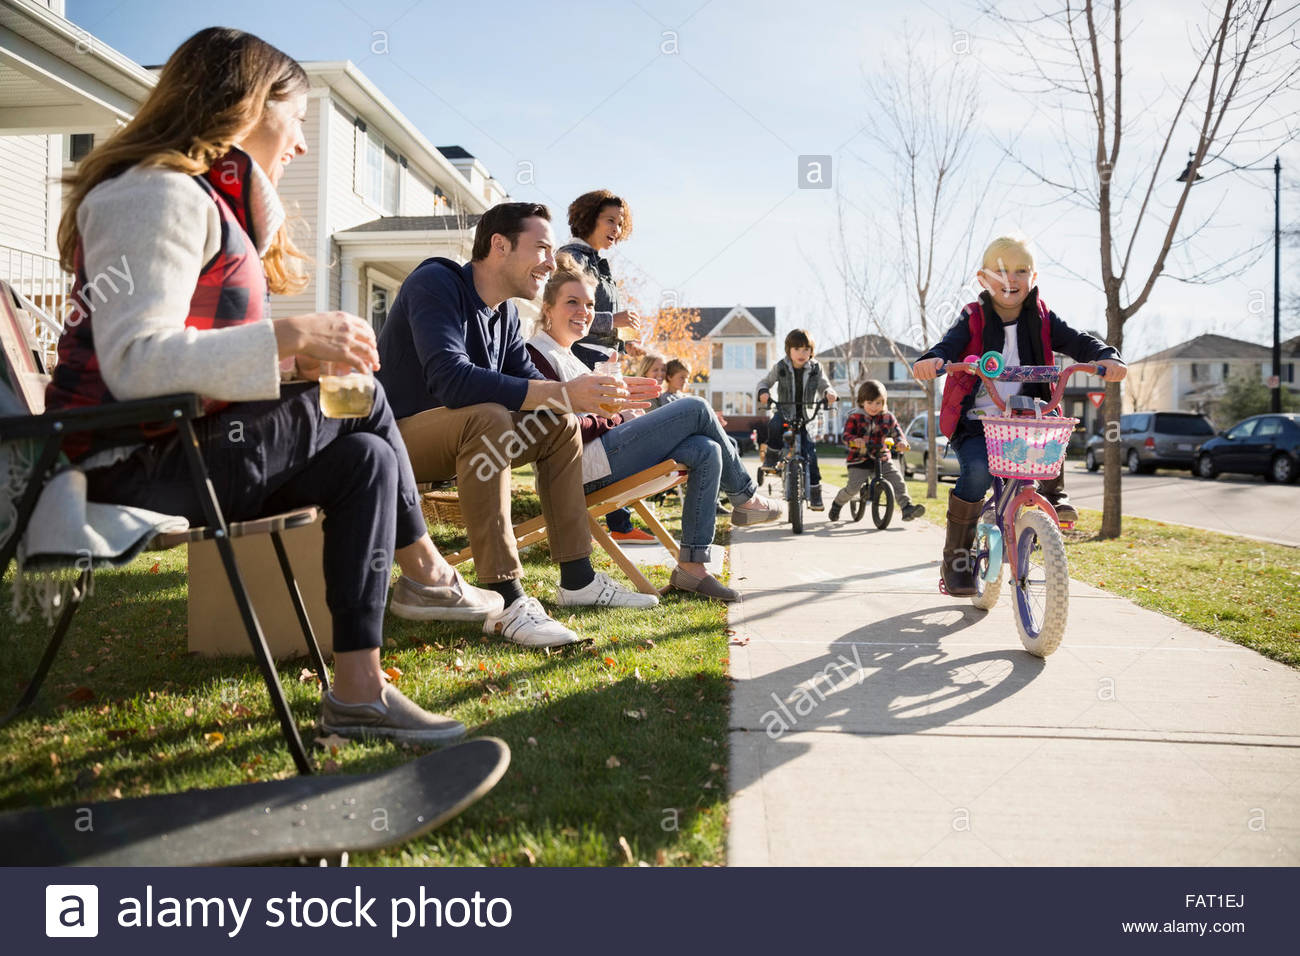 Neighbors watching kids ride bikes on sidewalk - Stock Image